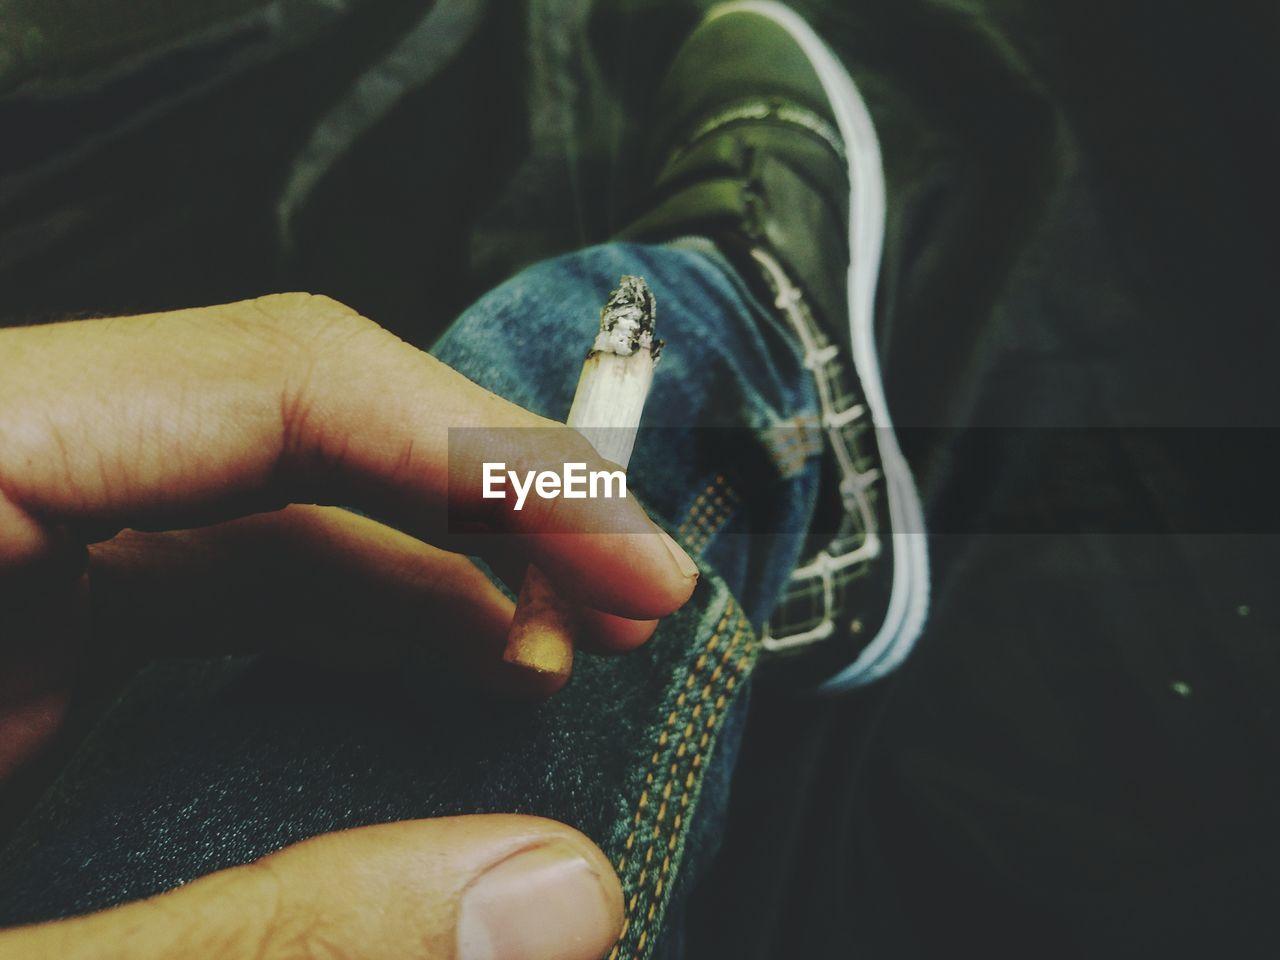 Cropped hand holding burning cigarette